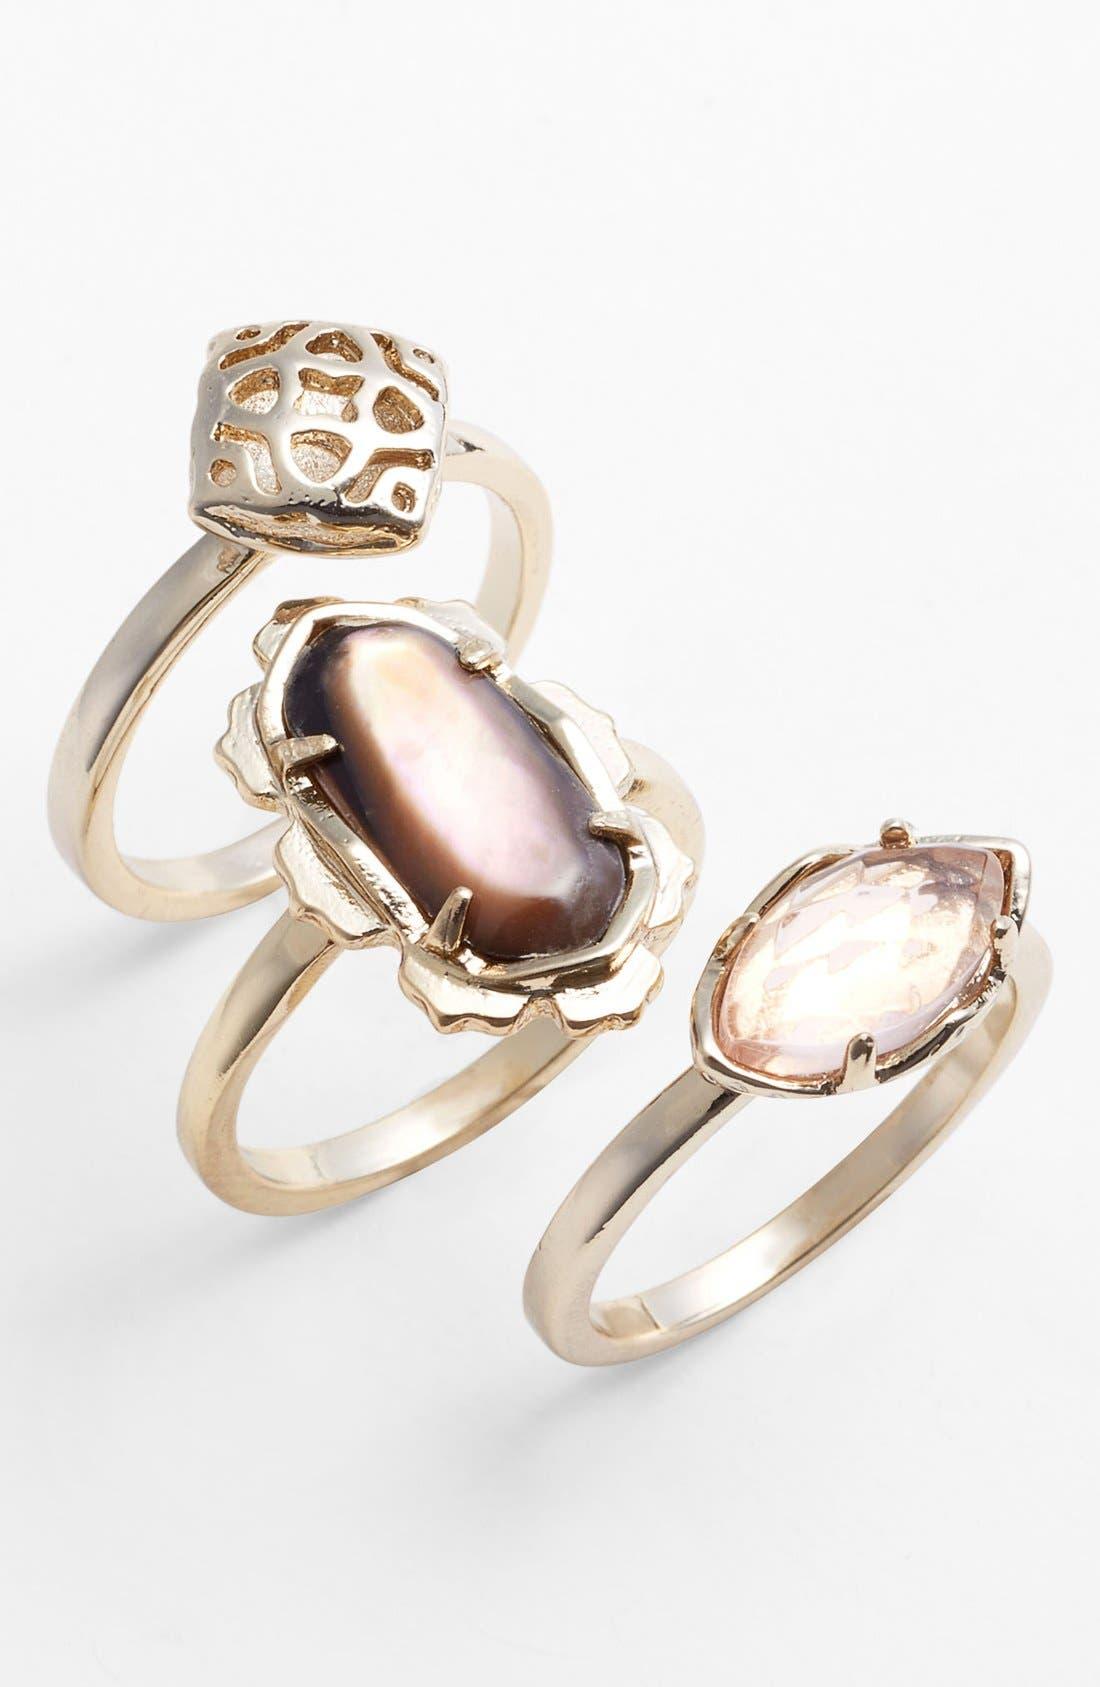 Main Image - Kendra Scott 'Isha' Mixed Stone Rings (Set of 3)